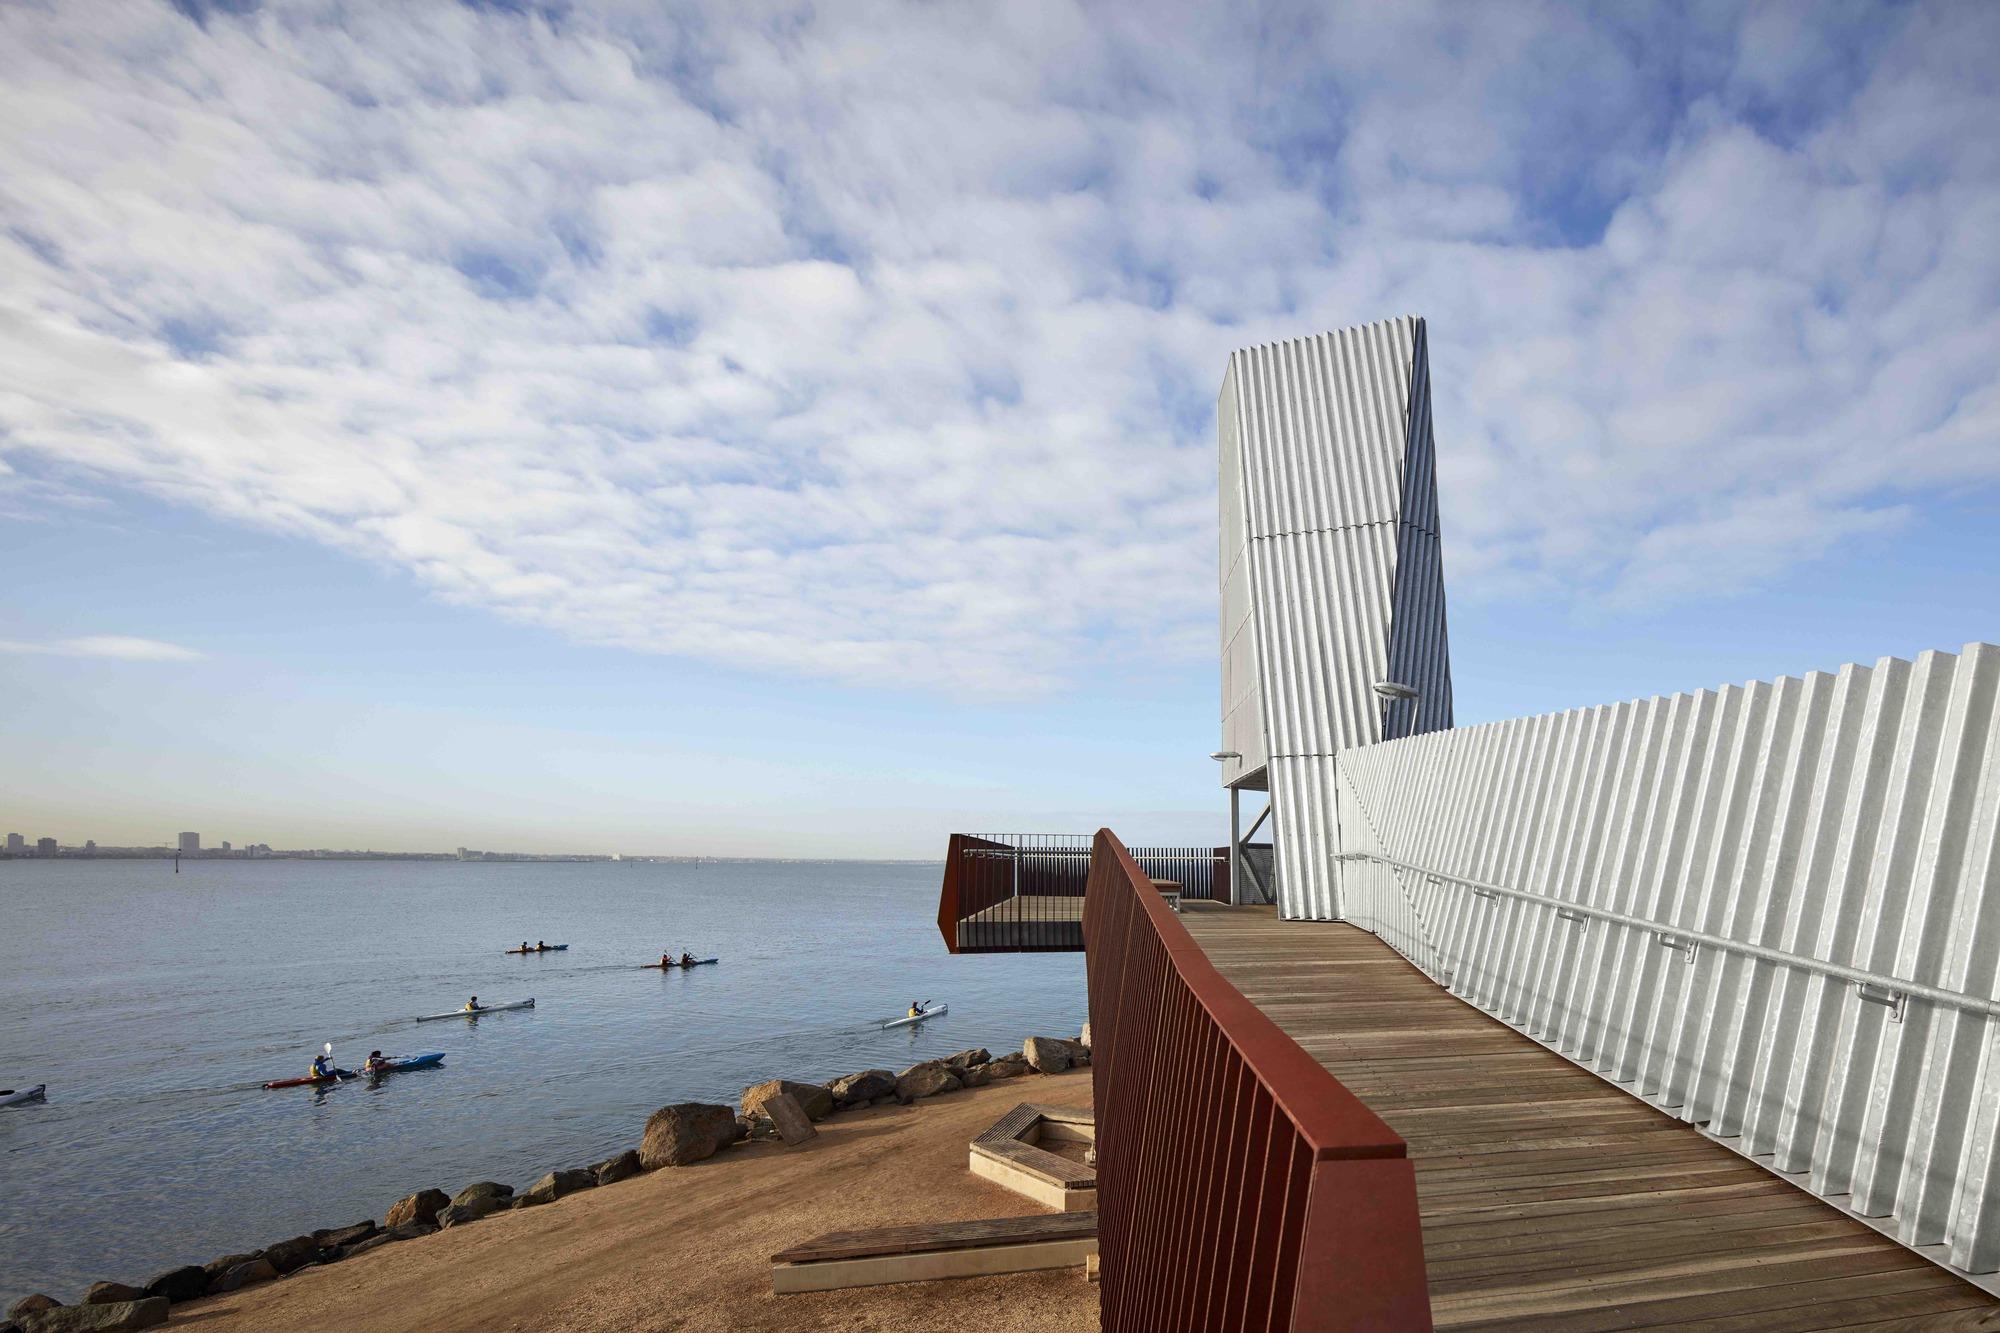 Gallery of sandridge lookout cox architecture 2 for Cox architecture